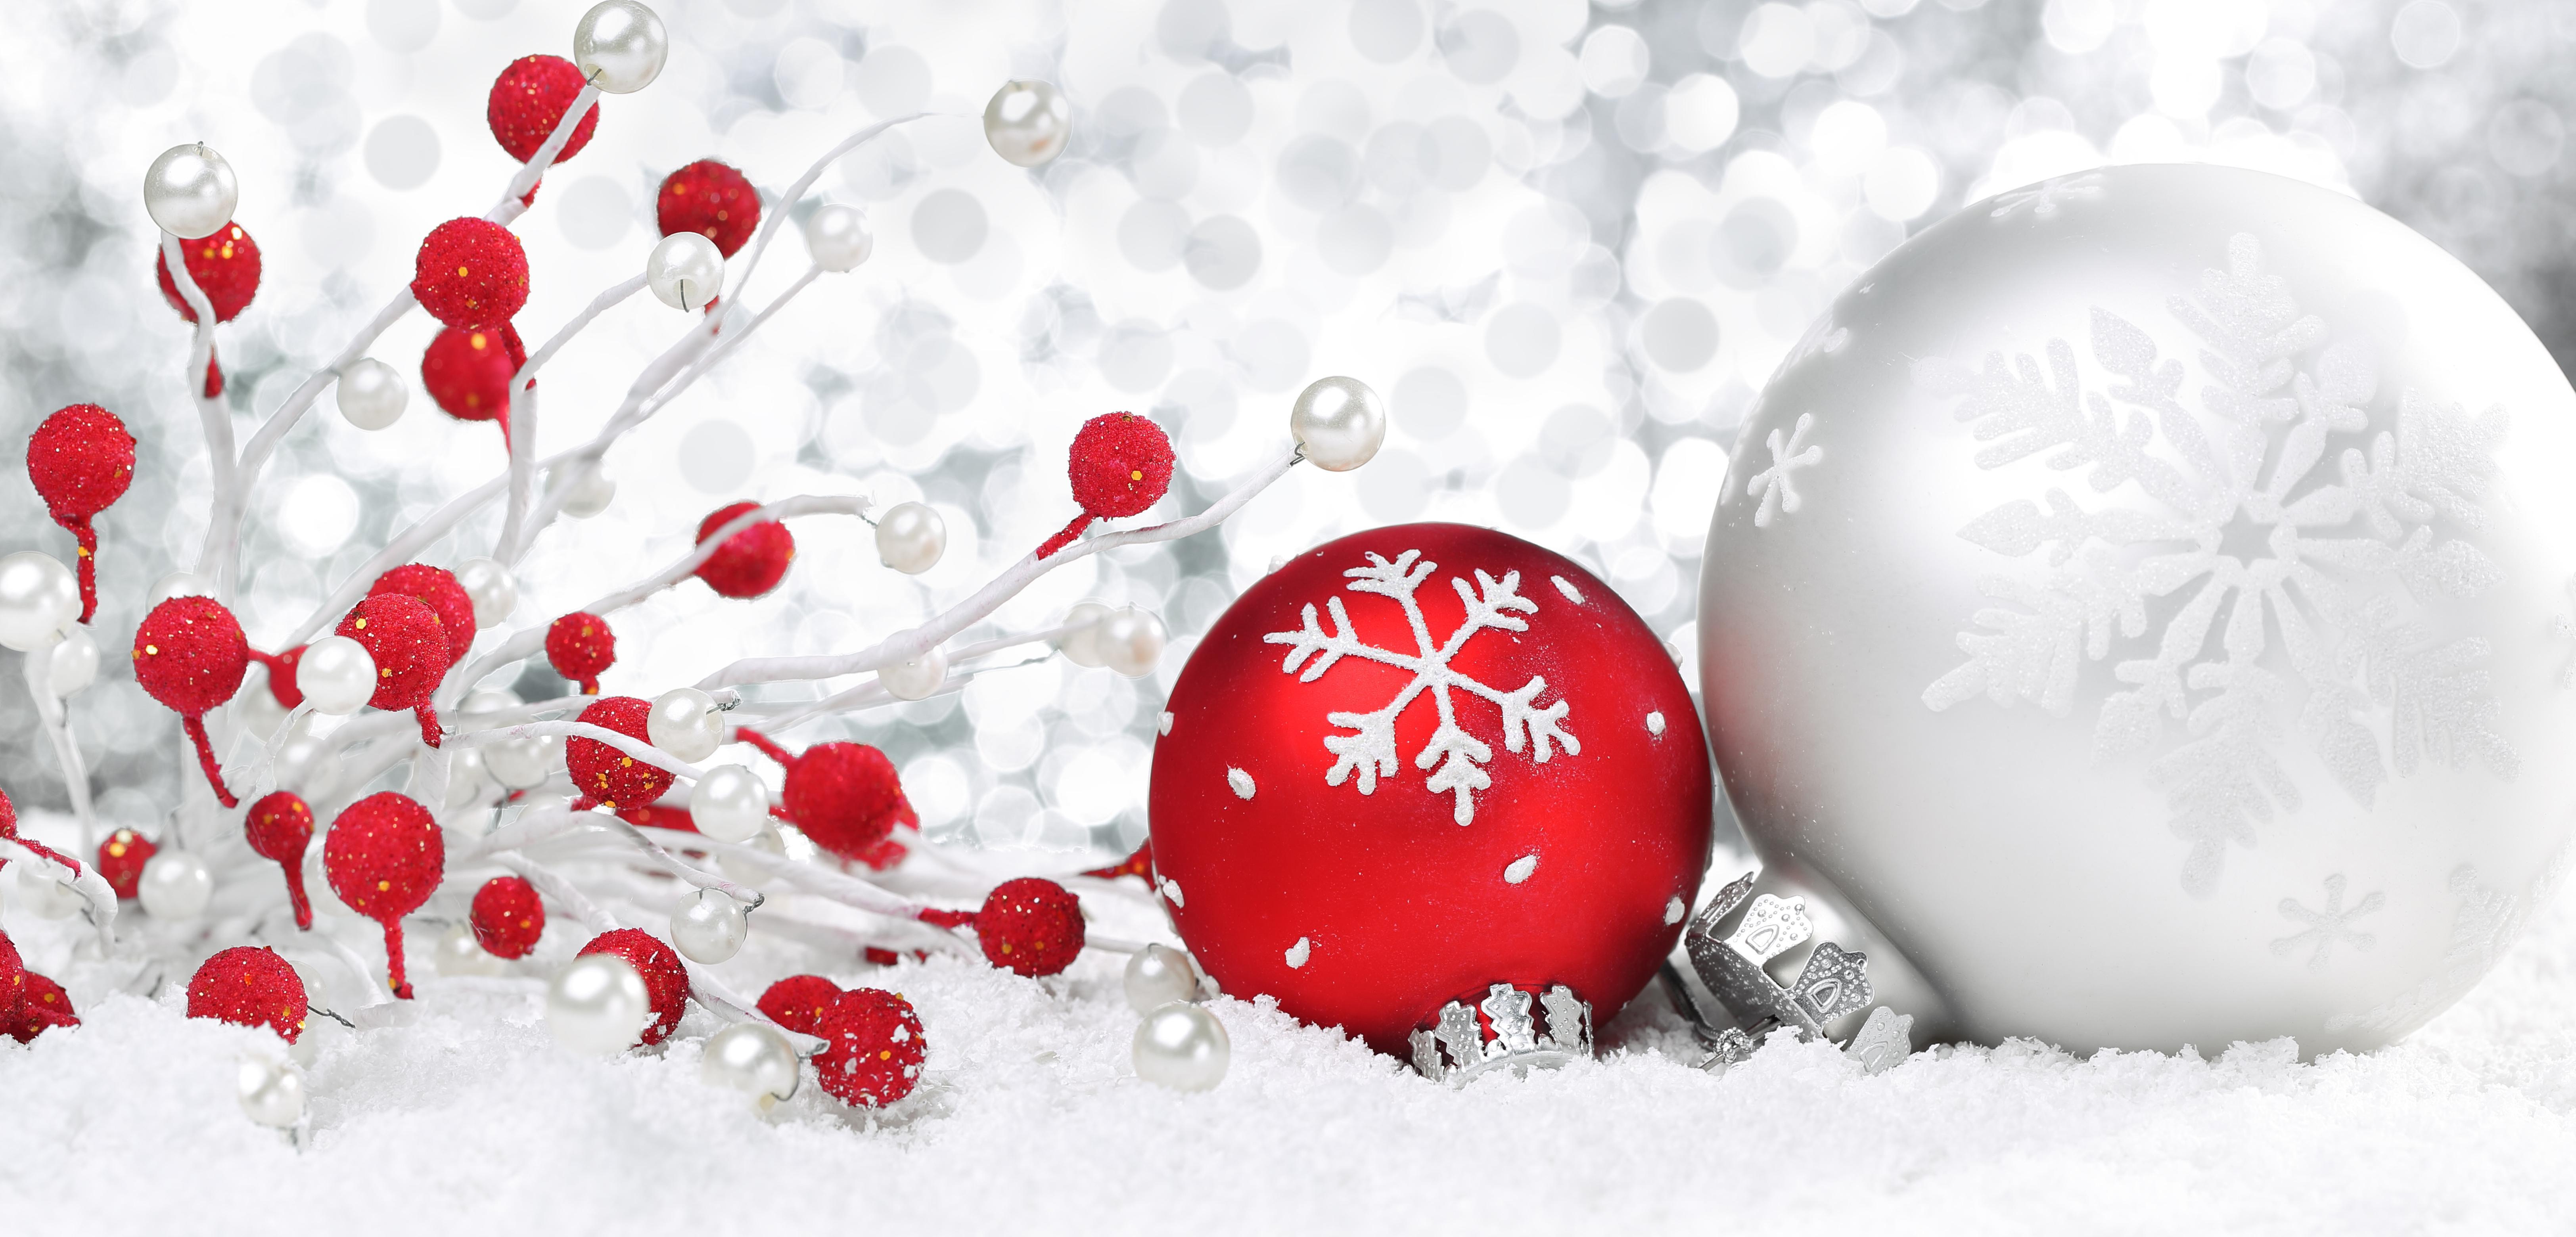 Обои На Стол Зима Новый Год Бесплатно